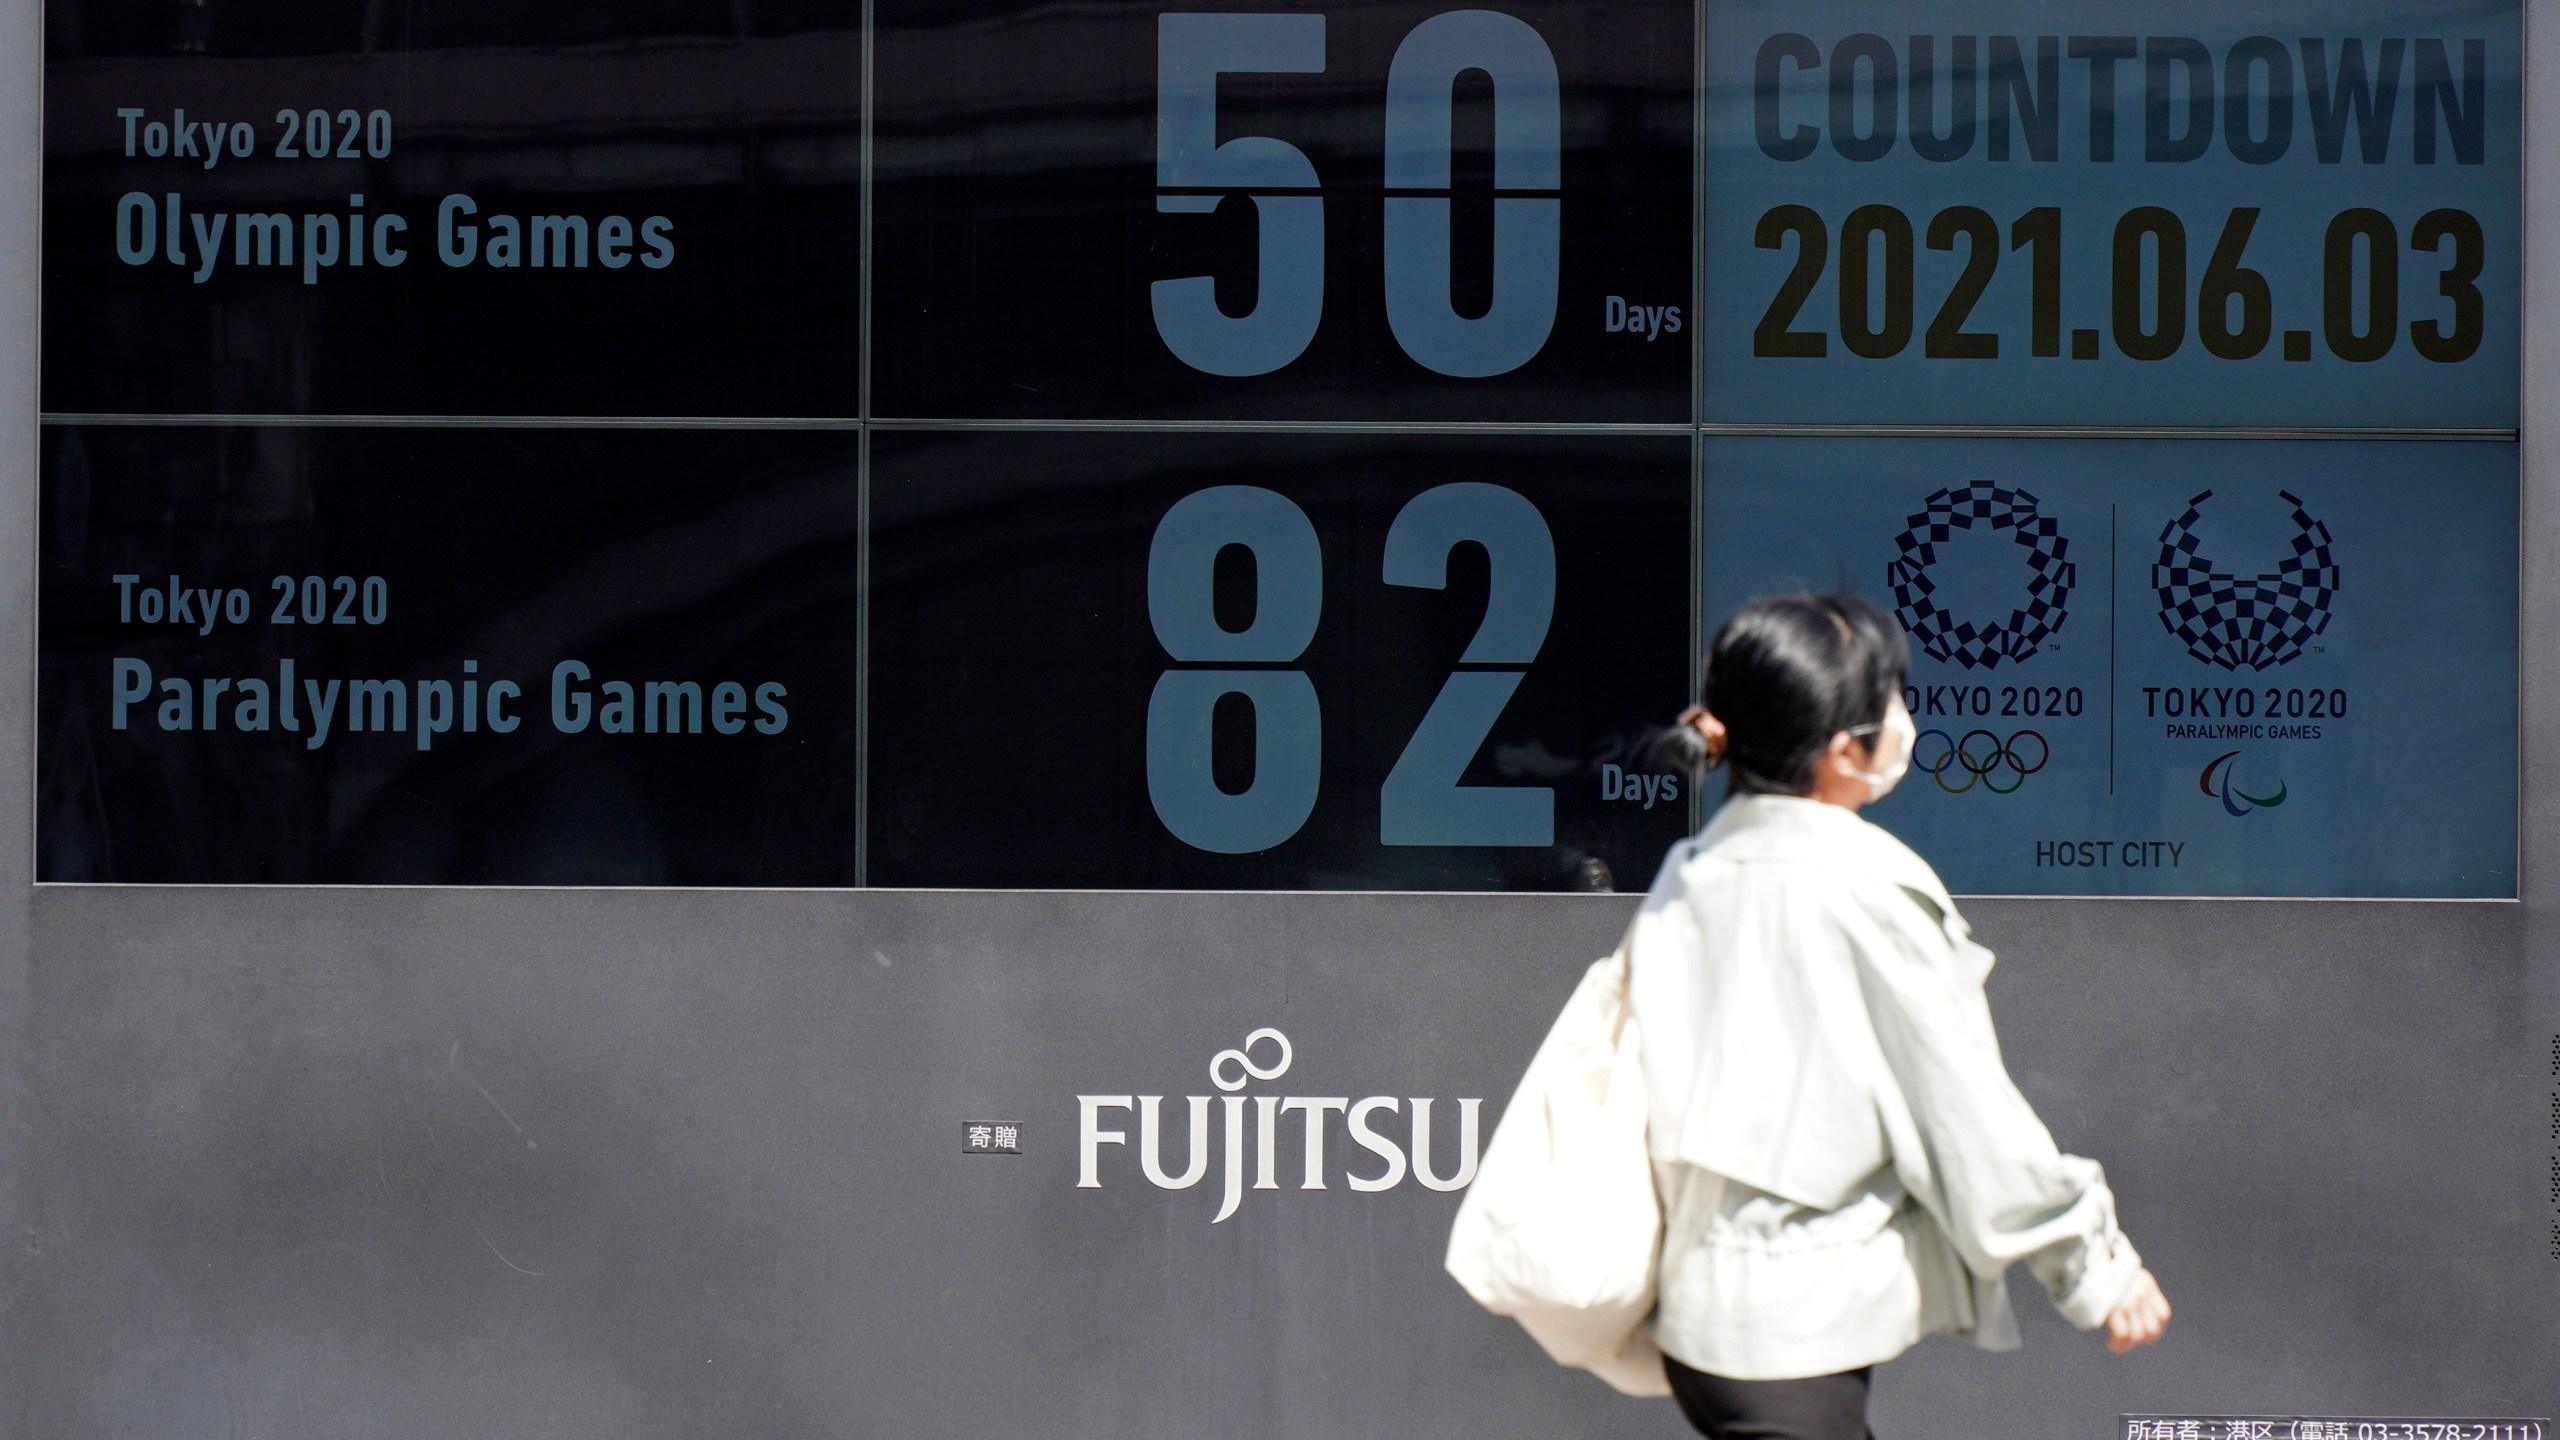 Japan Olympics 50 days